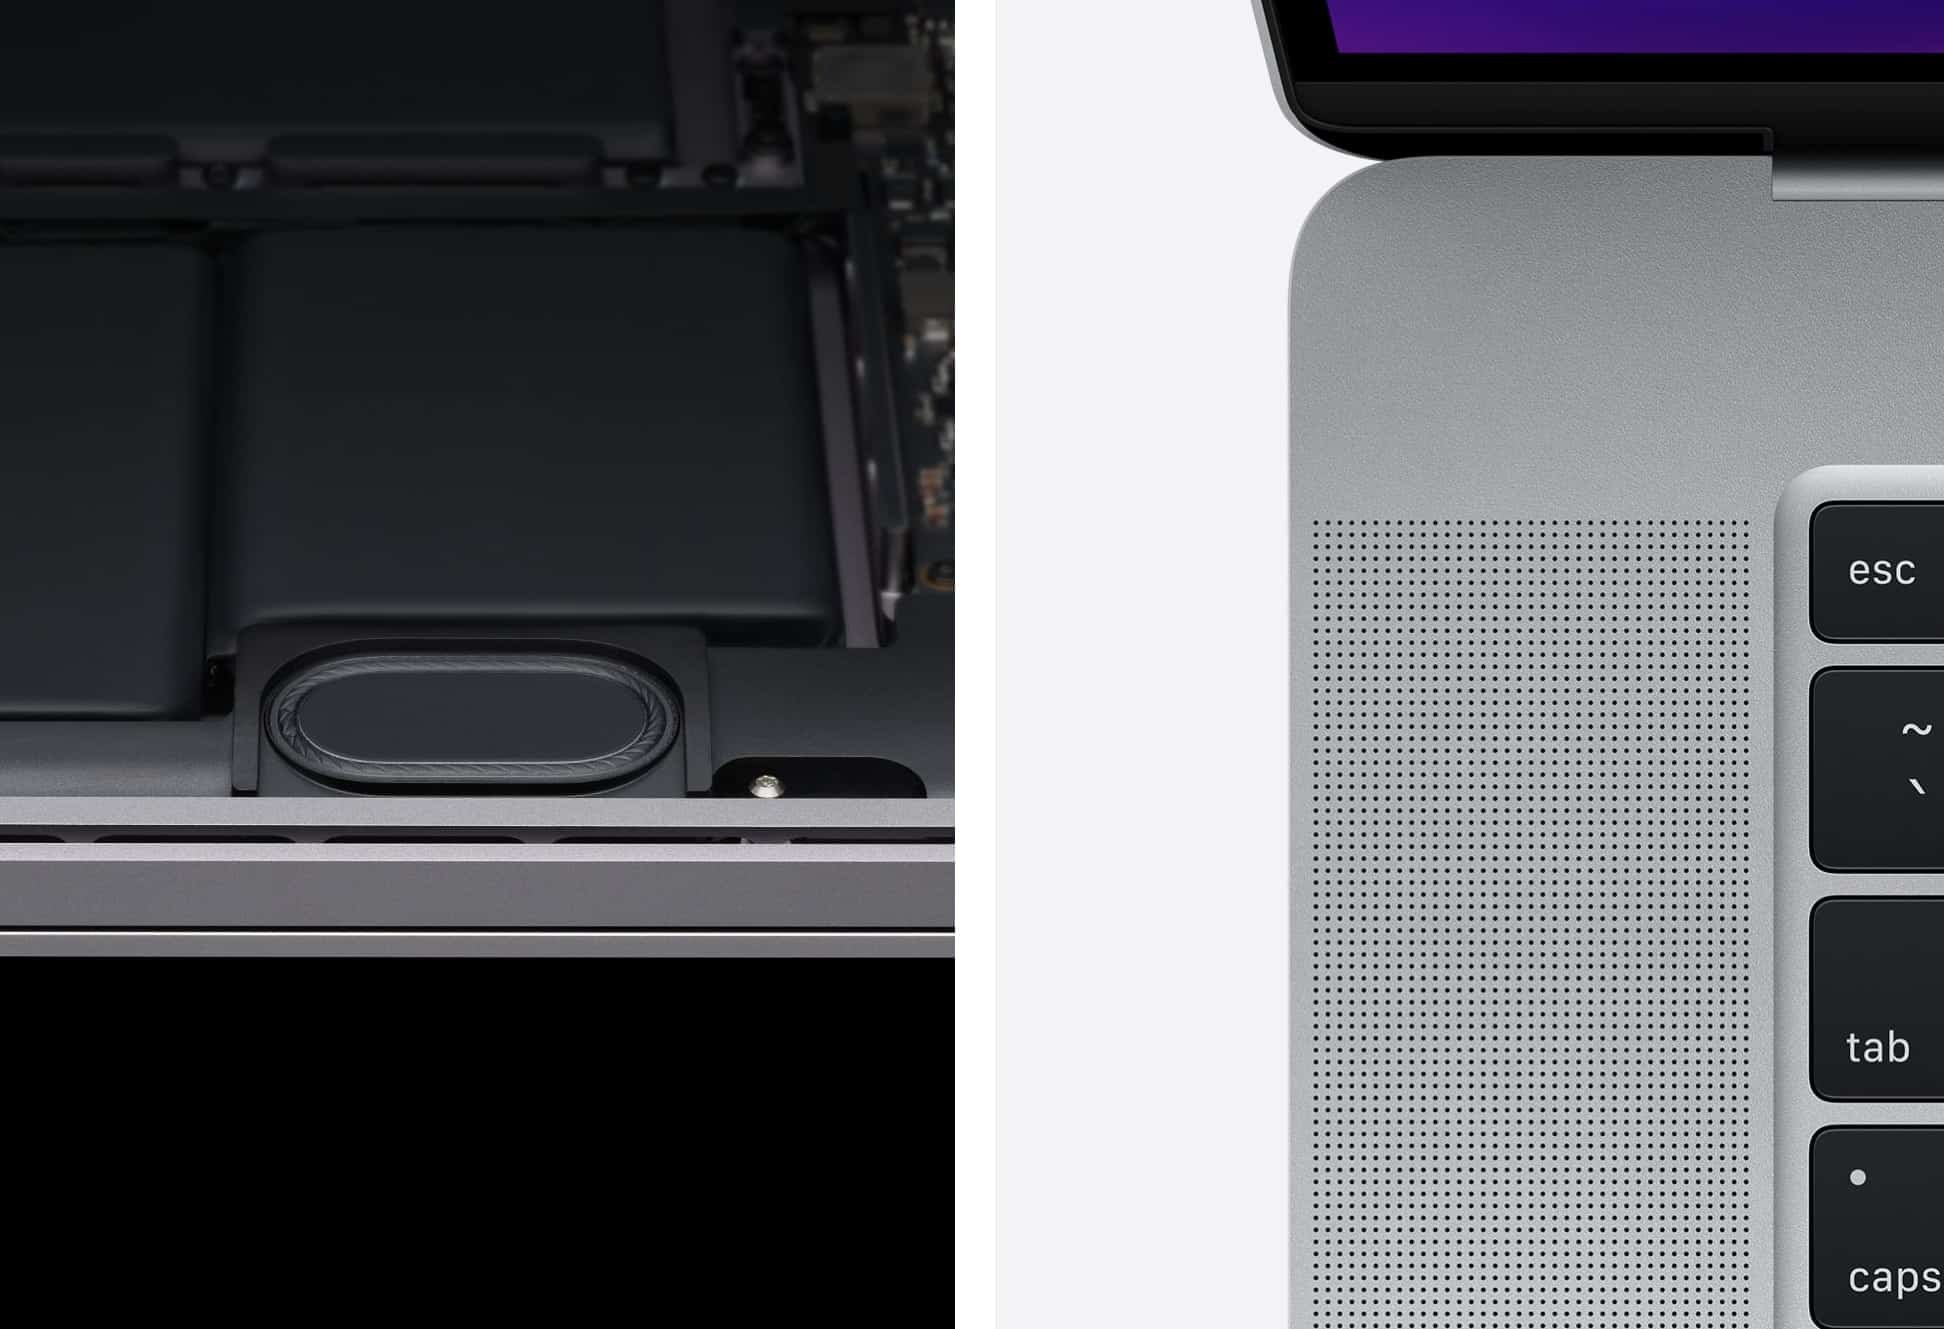 Dàn loa tiên tiến trên MacBook Pro 2019 16 inch